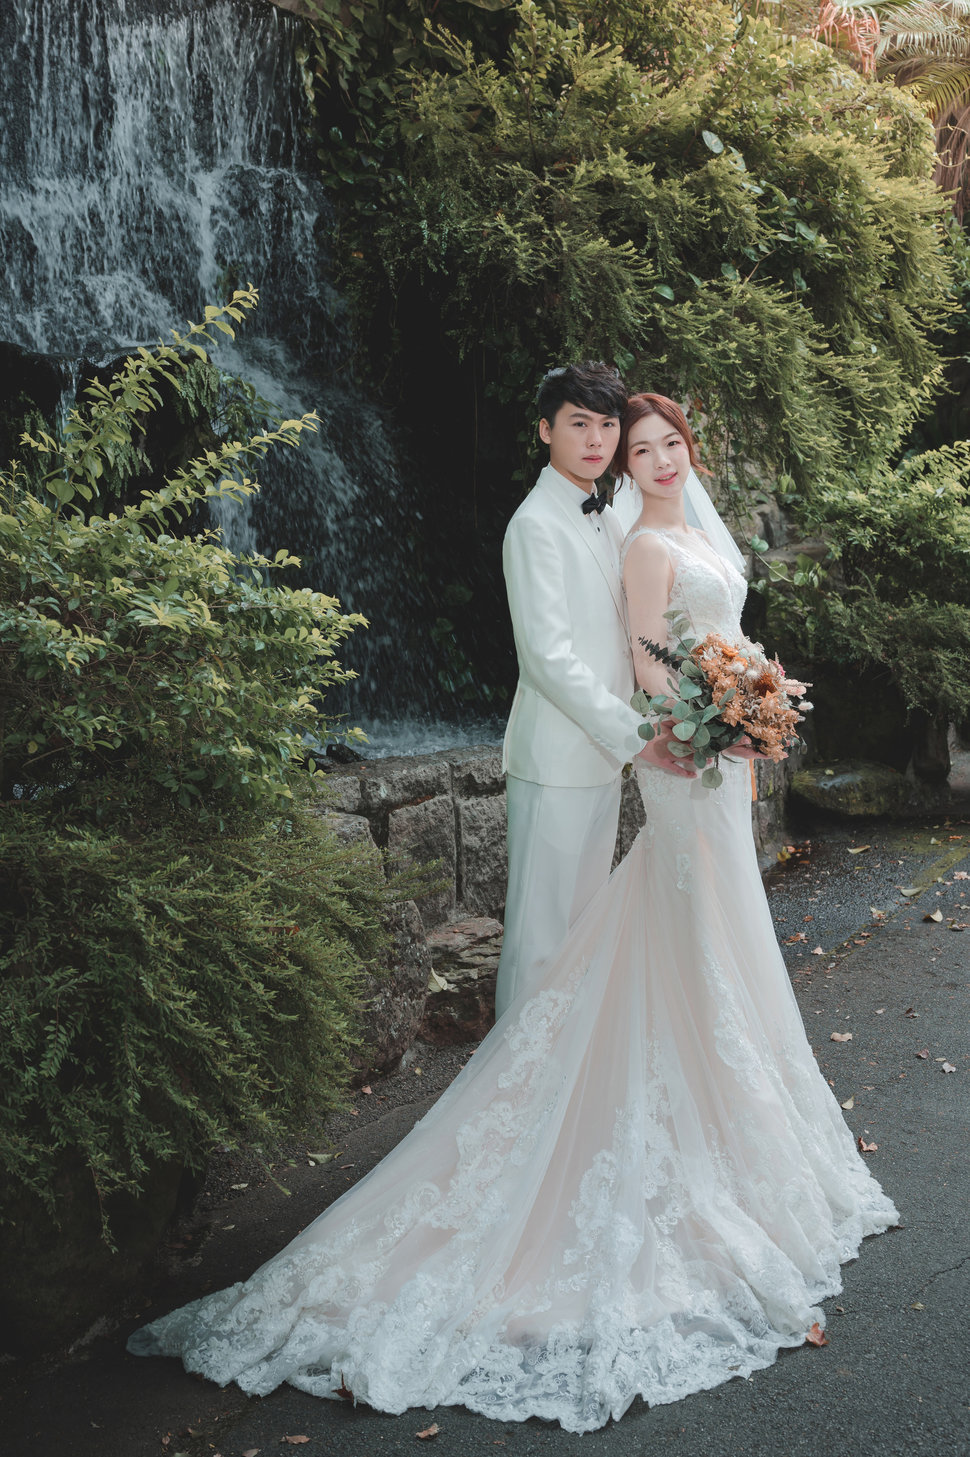 20200111-YEU_5497-1 - 花蓮婚紗 - Sposa Bella《結婚吧》